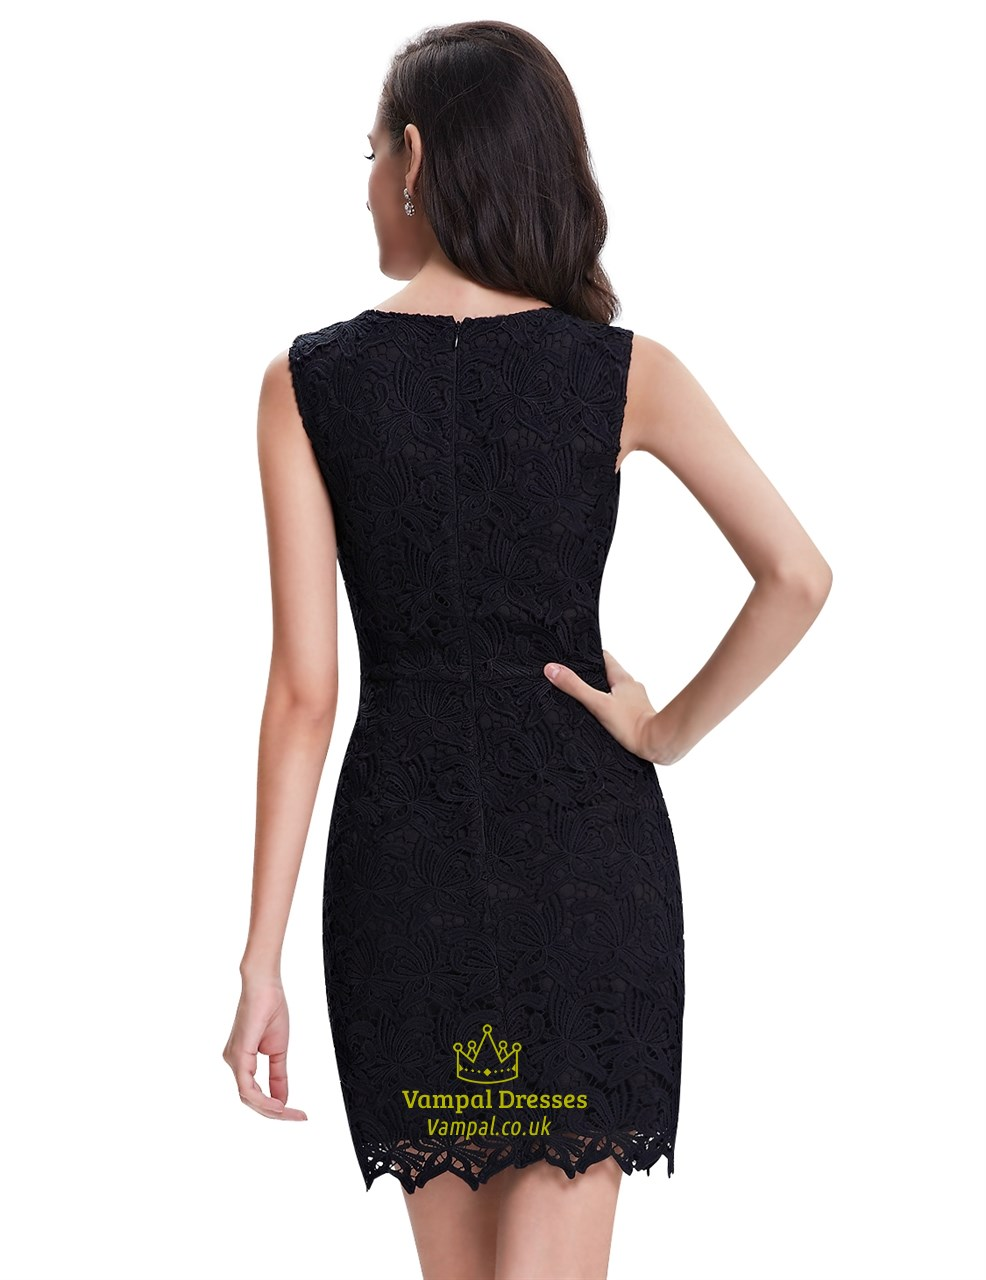 c24a3897d8a9 Elegant Black Lace Column Sleeveless Mini Cocktail Party Dress ...